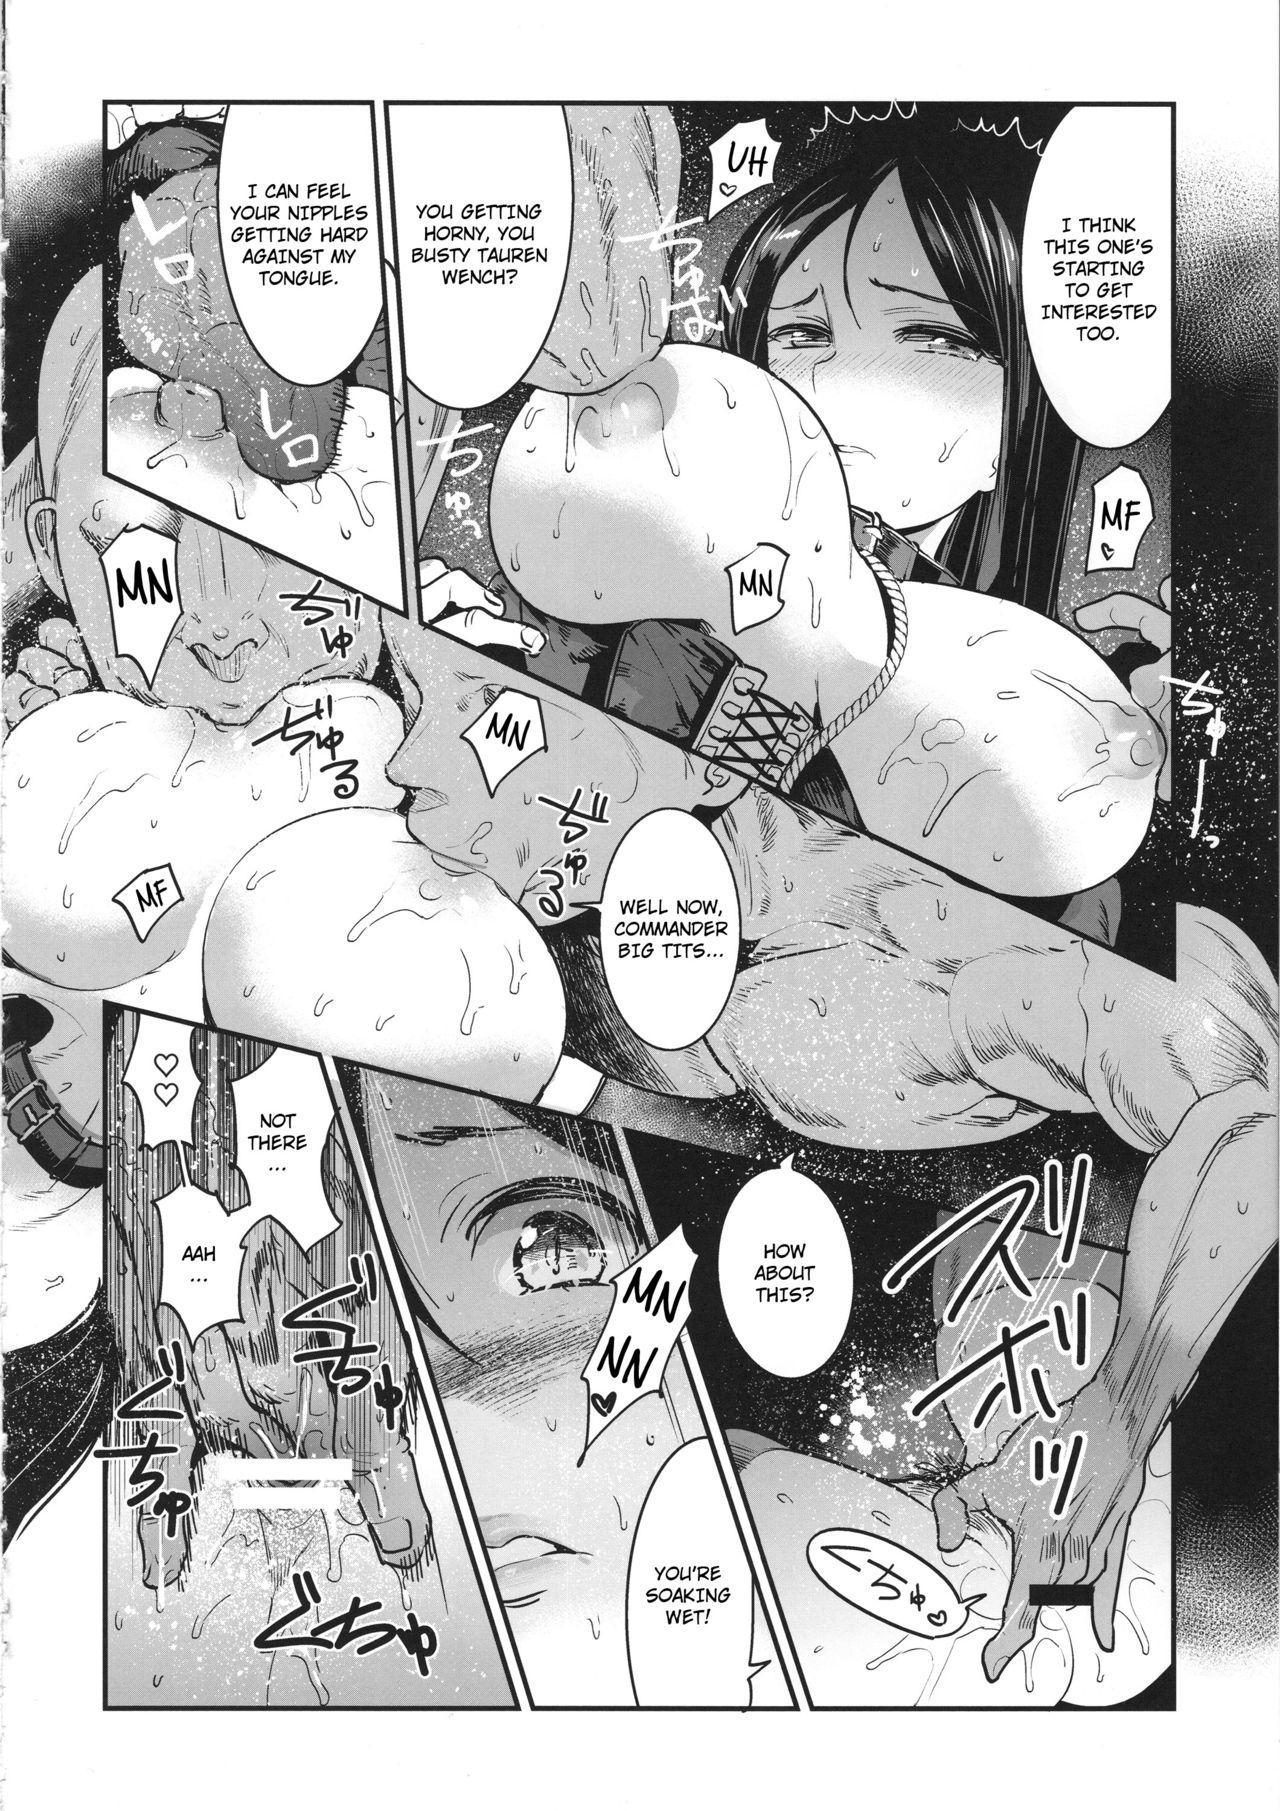 GirlPan Rakugakichou 9 | GirlPan Sketchook 9 8